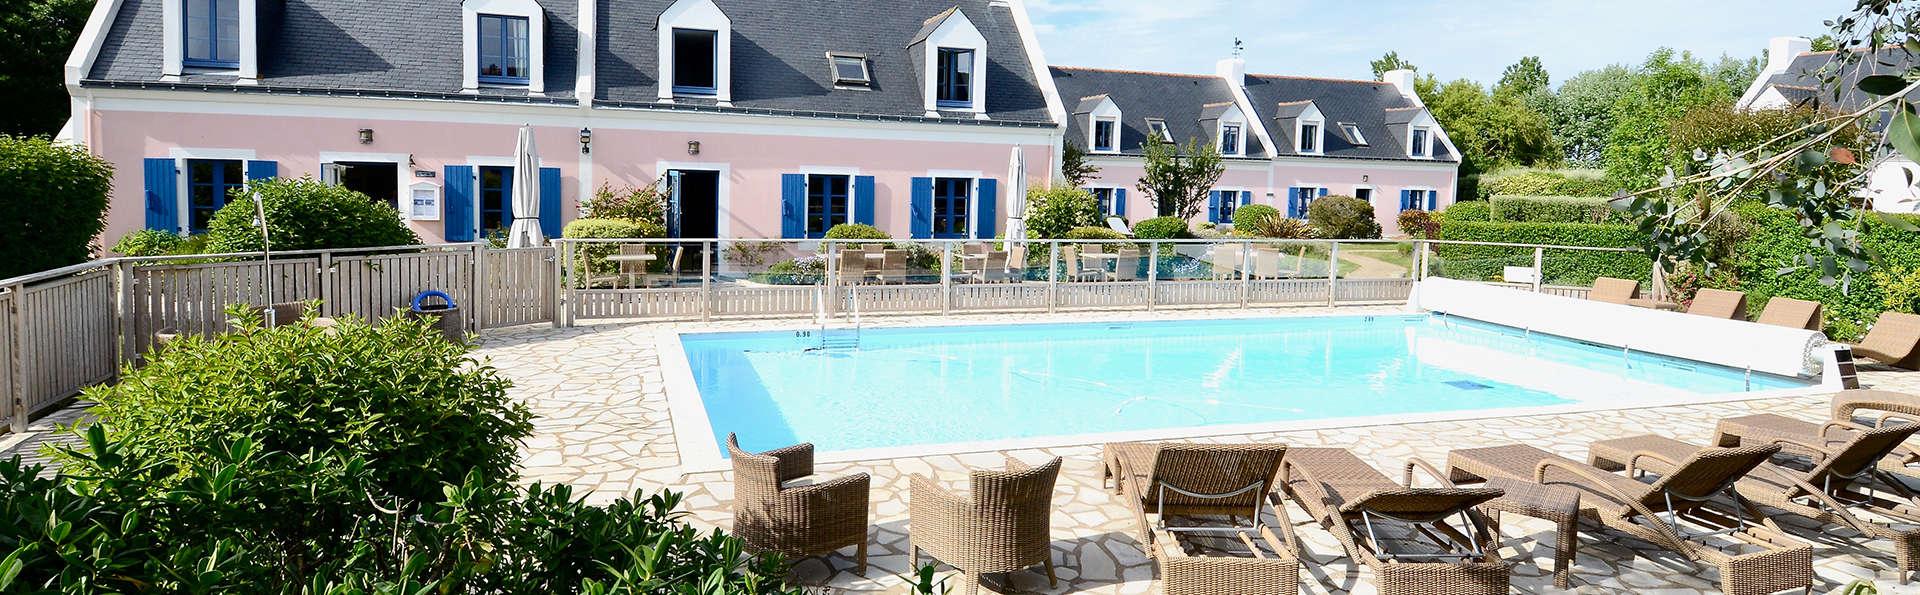 Hôtel la Désirade - Belle-Ile-en-Mer - Edit_Front2.jpg